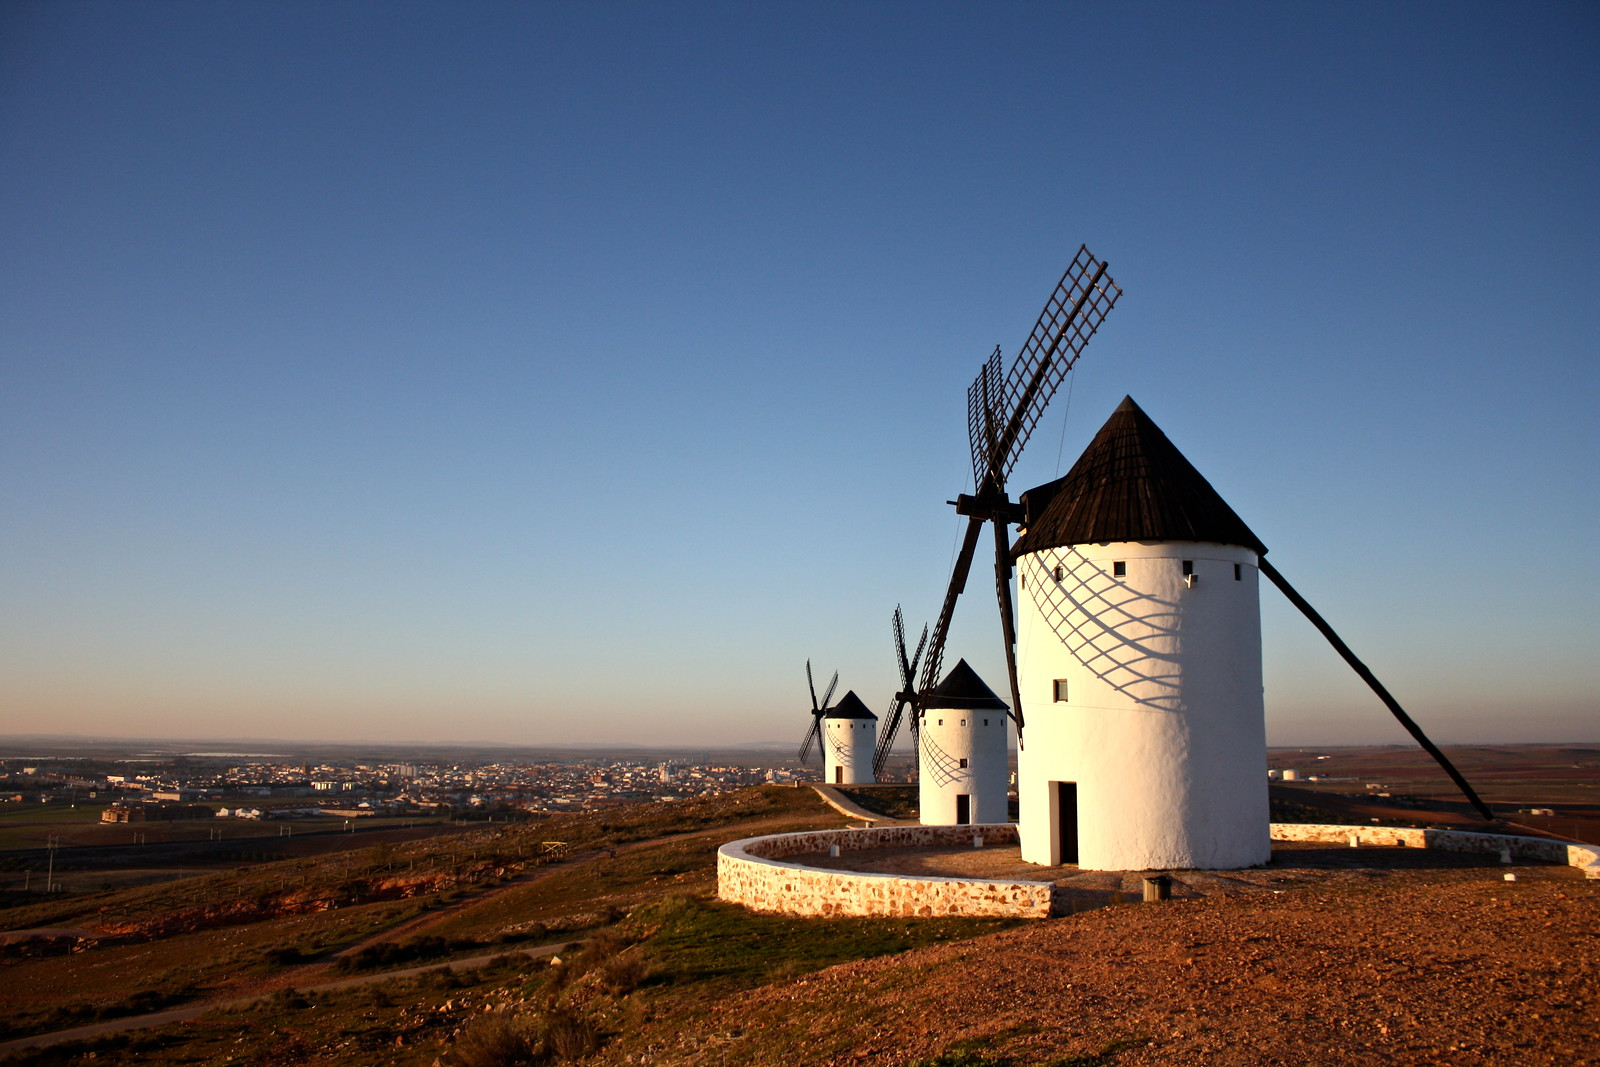 Windmills in Alcázar de San Juan, Spain